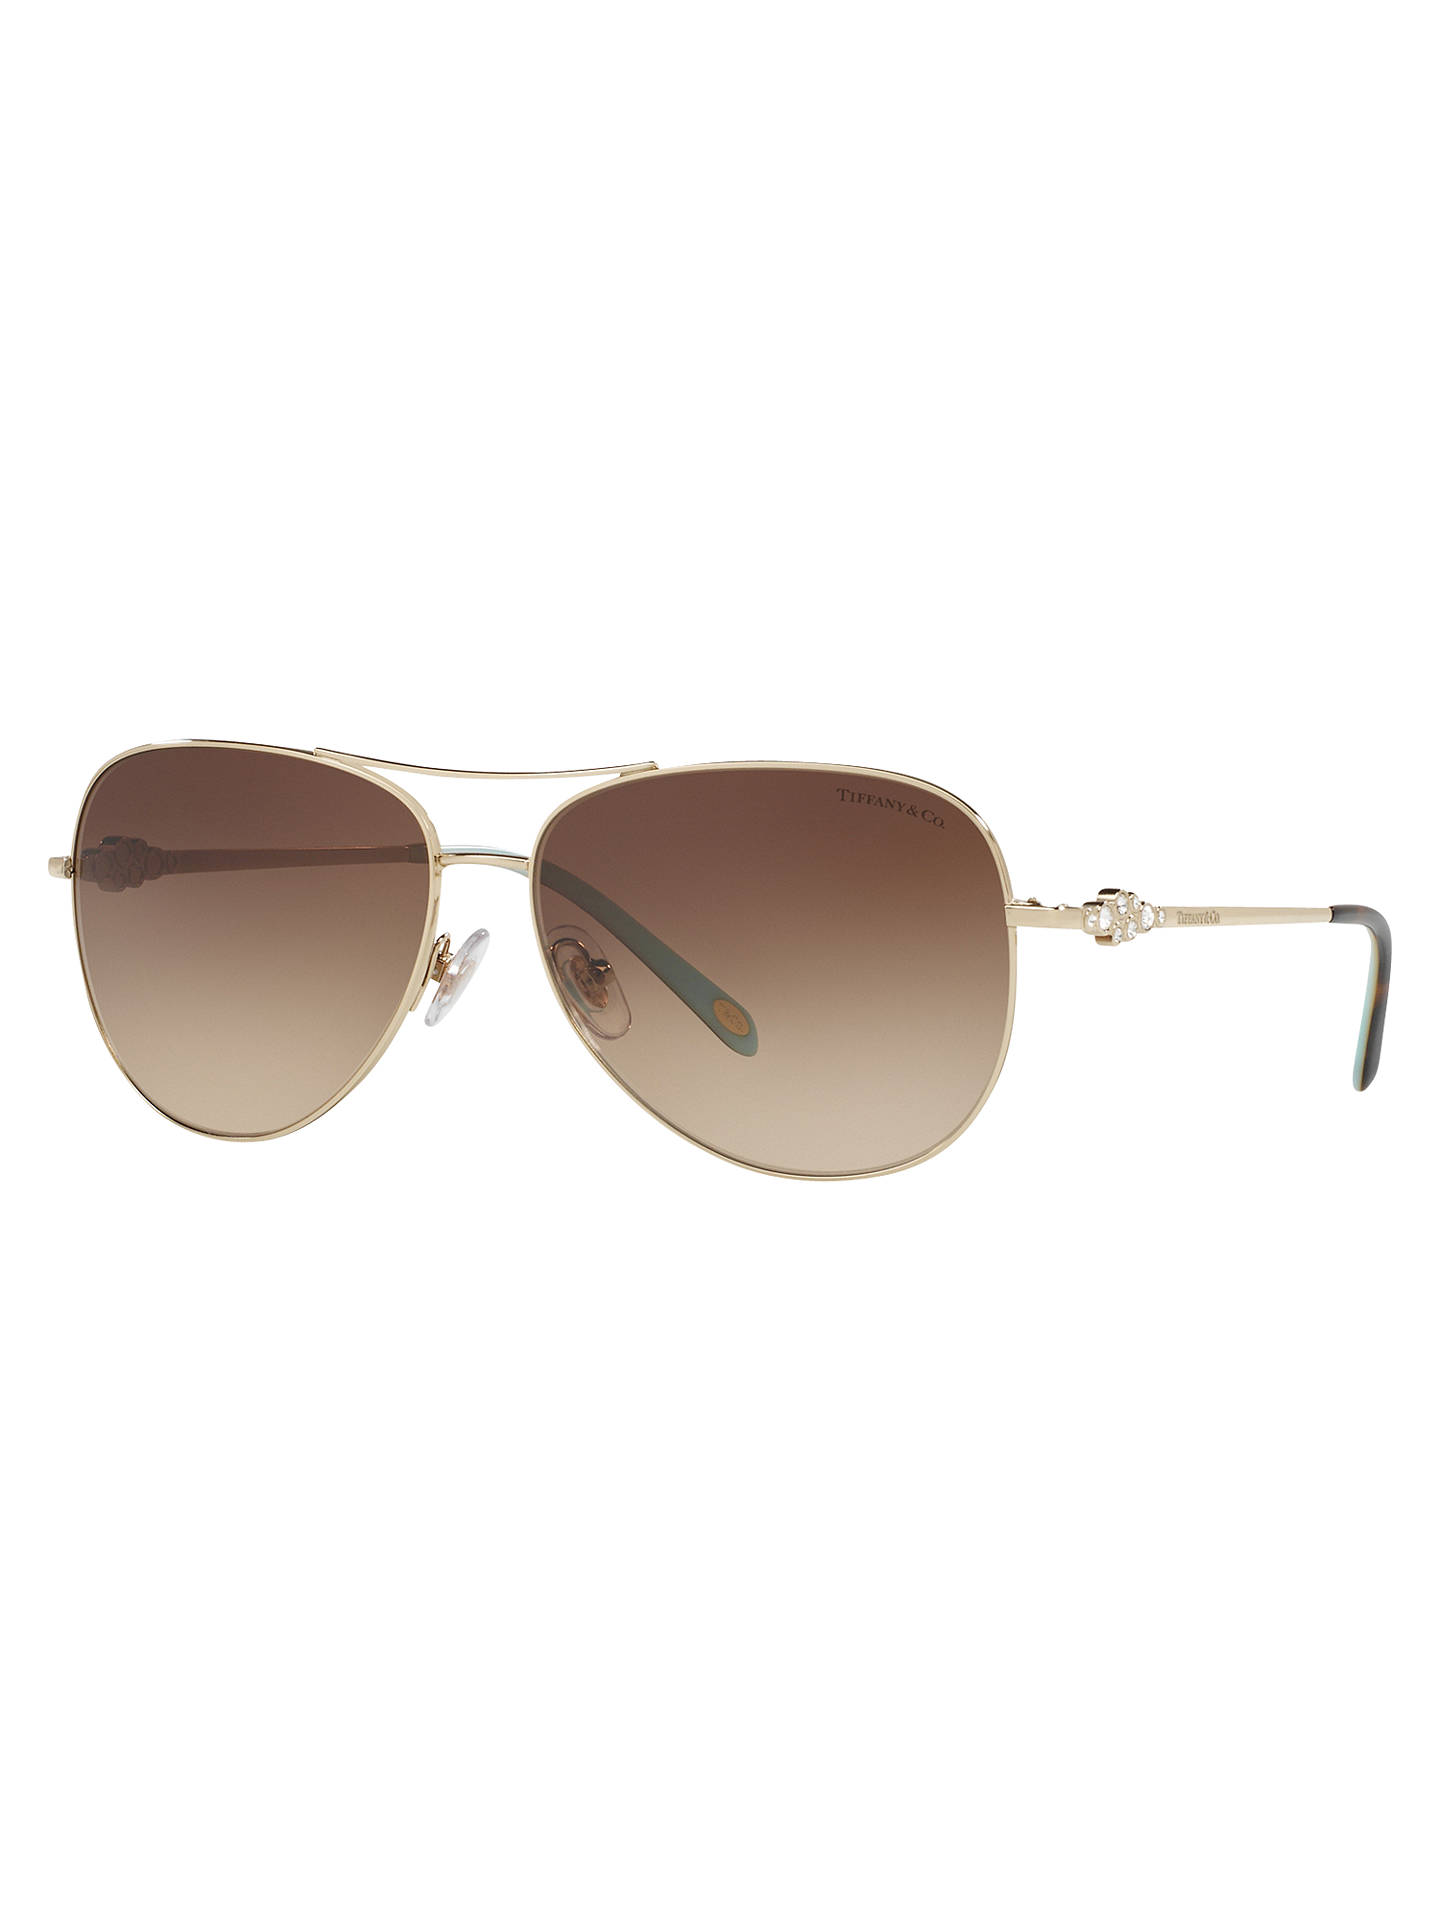 8c4dbcc57b0b Buy Tiffany   Co TF3052B Aviator Sunglasses